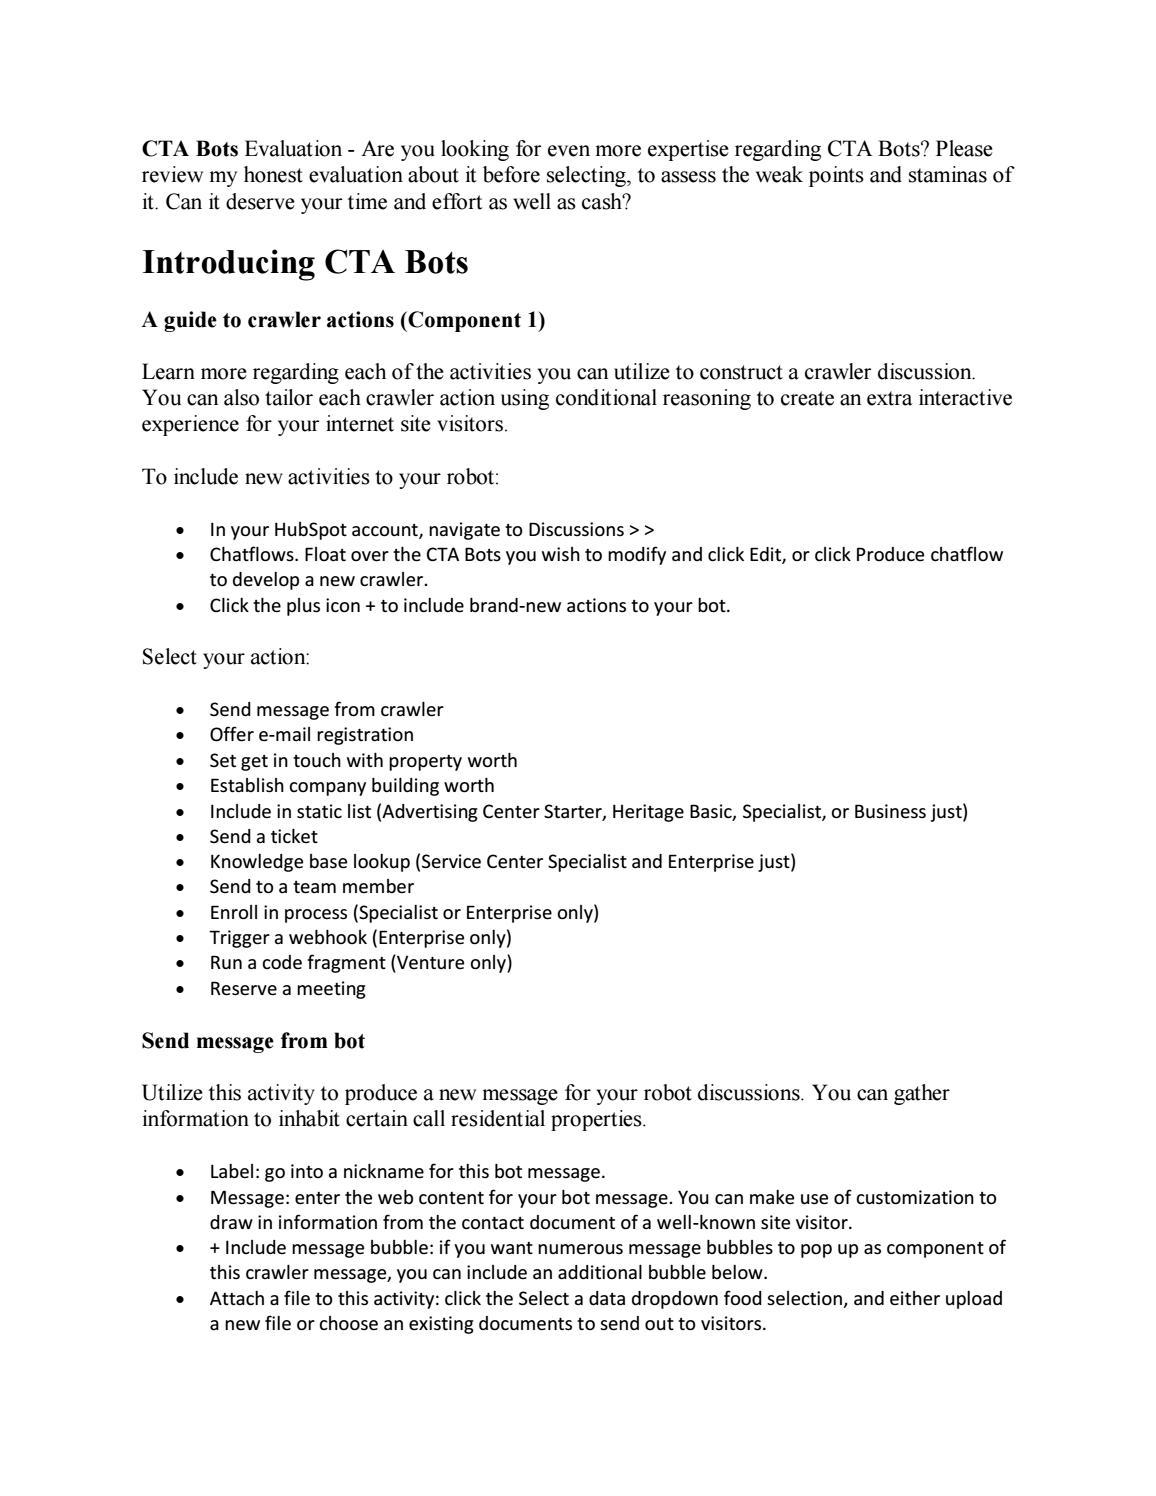 CTA Bots Review And Free Bonus by richardlarue - issuu